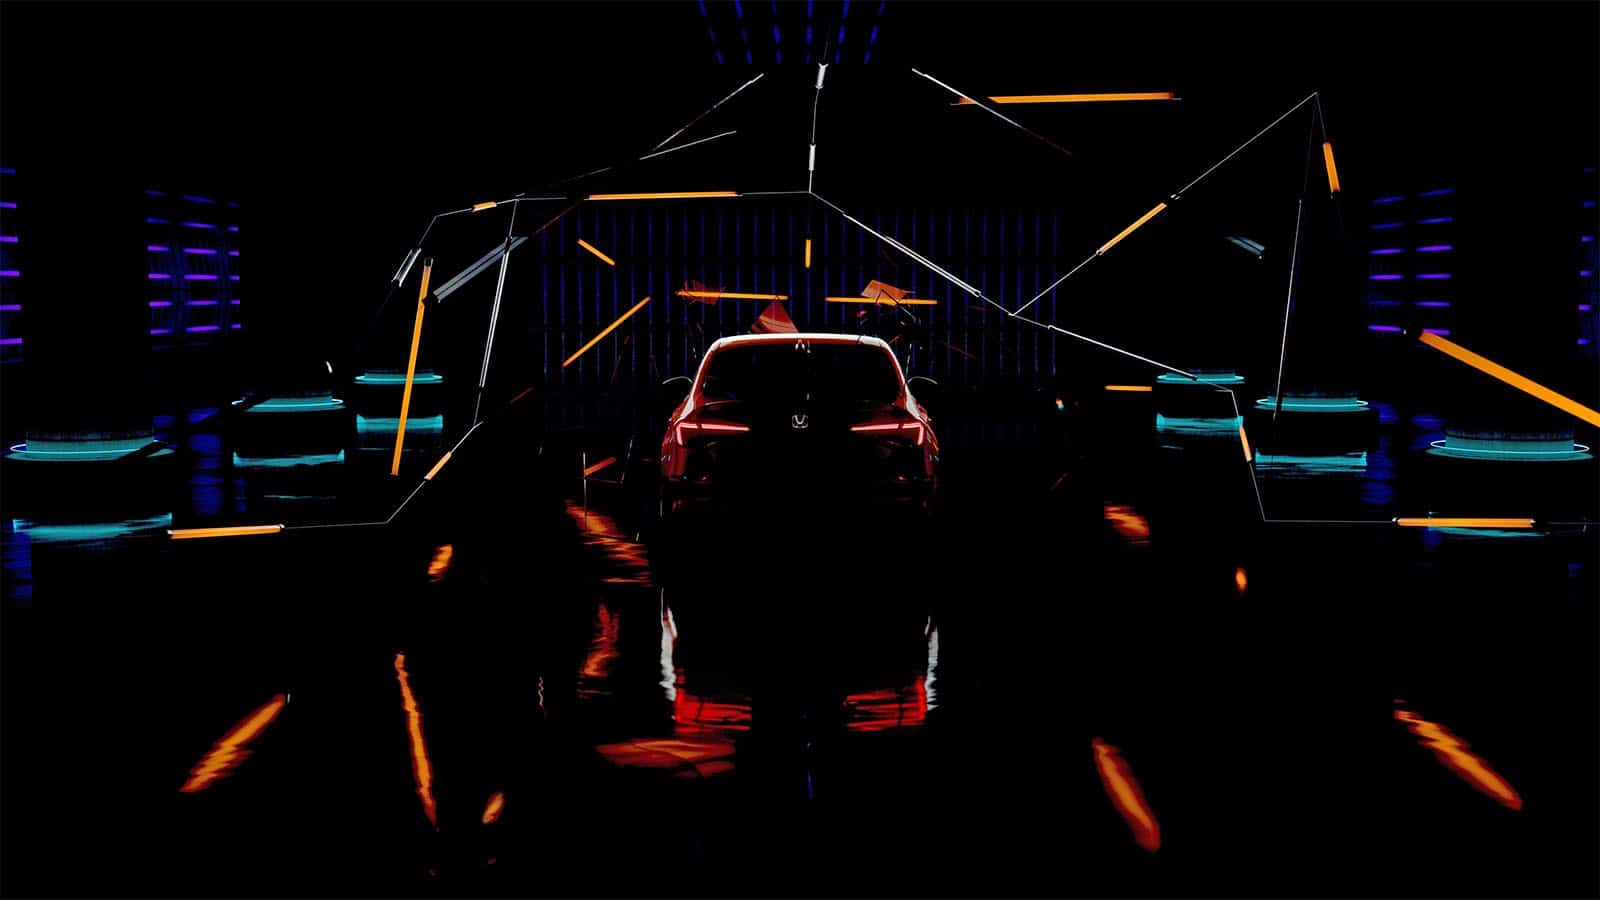 Redesigned 2022 Honda Civic Debuting Nov. 17th